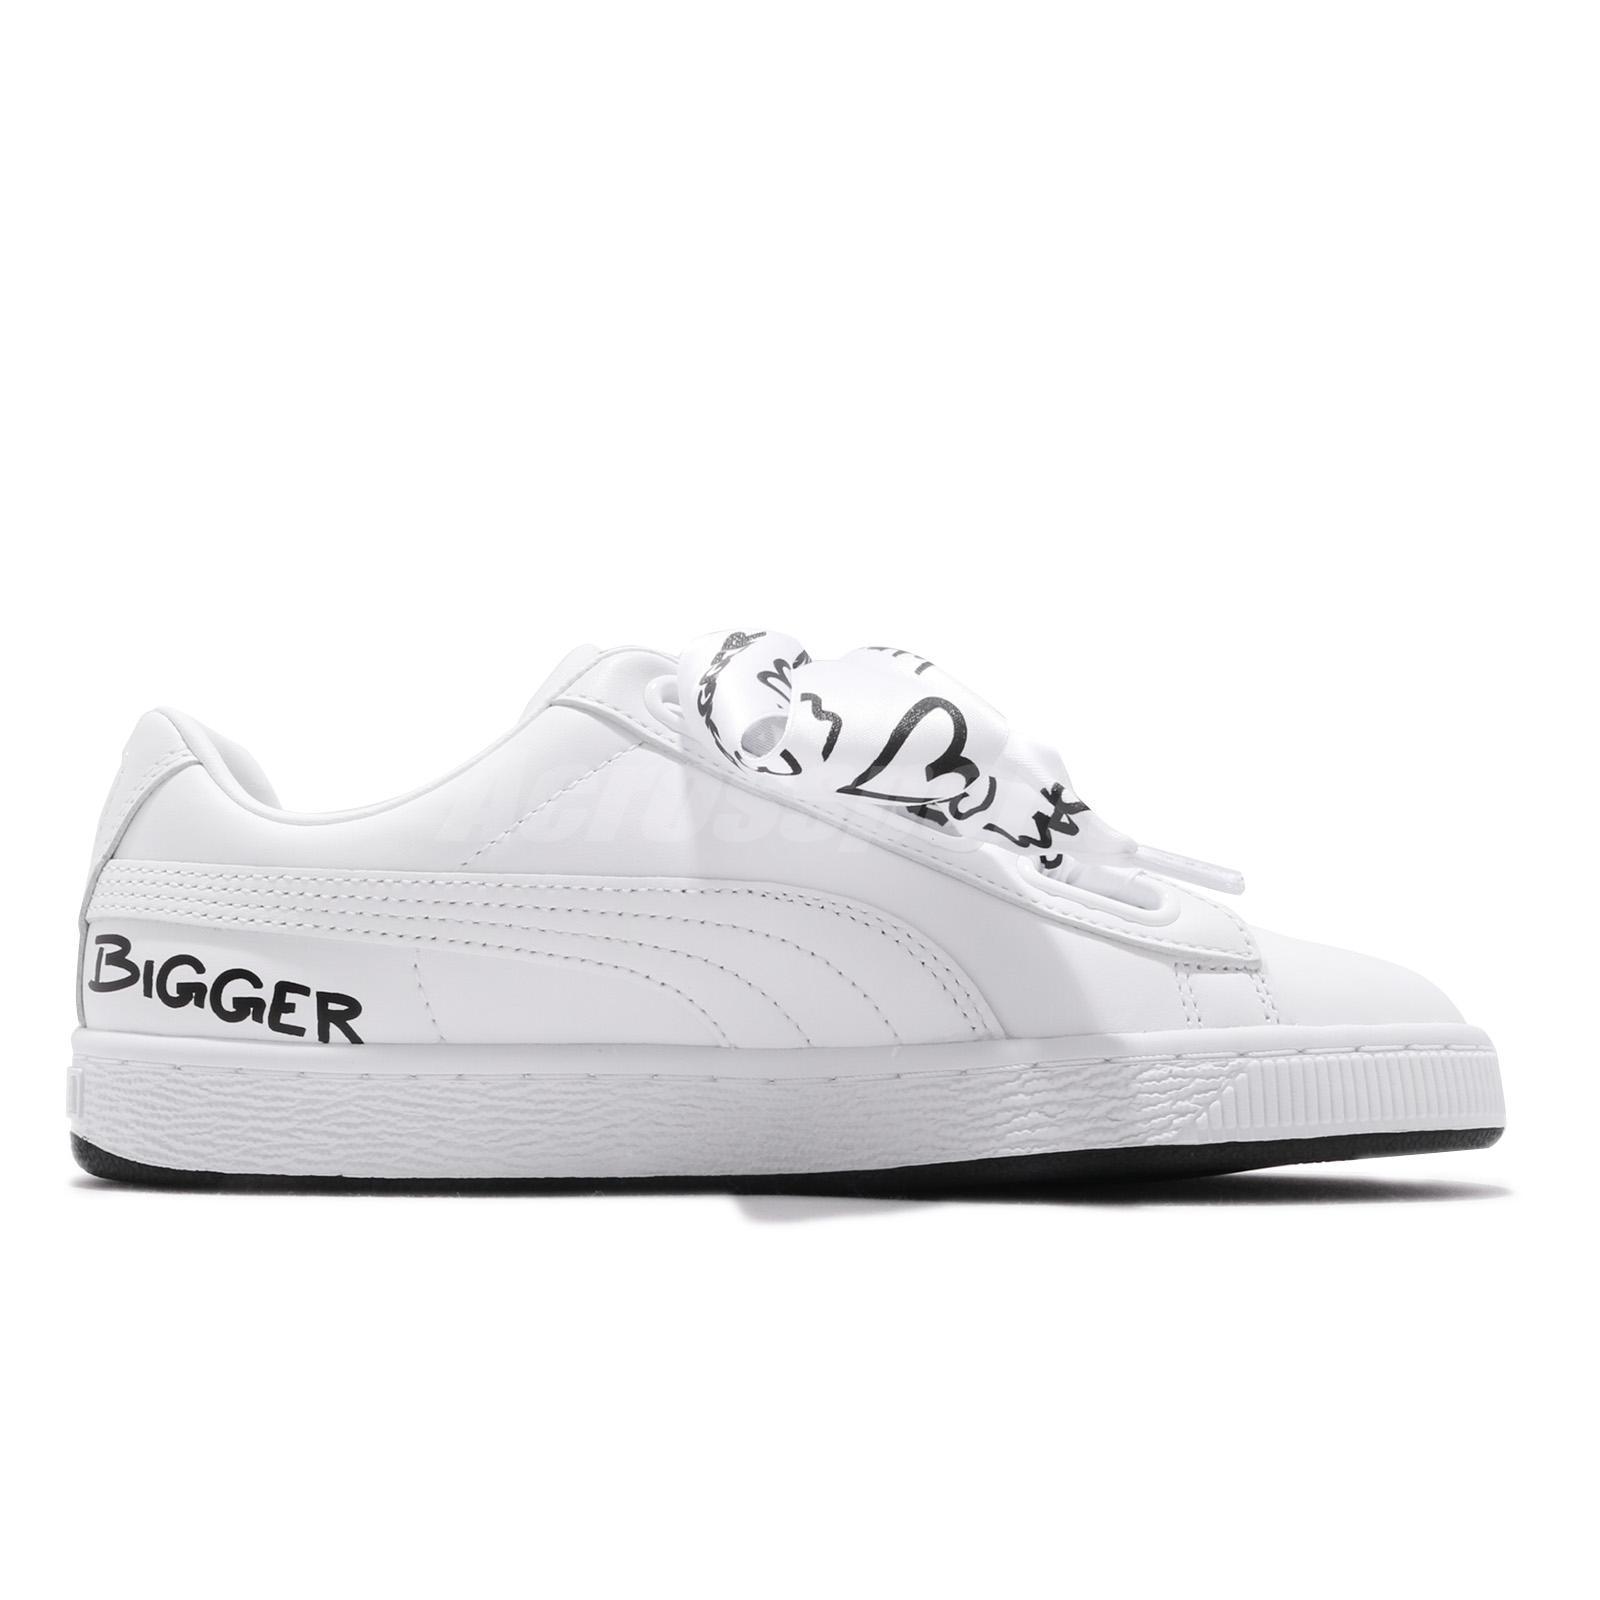 new york latest genuine shoes Puma Basket Heart HNDWRTTN Wns Hand Written Black White Women ...